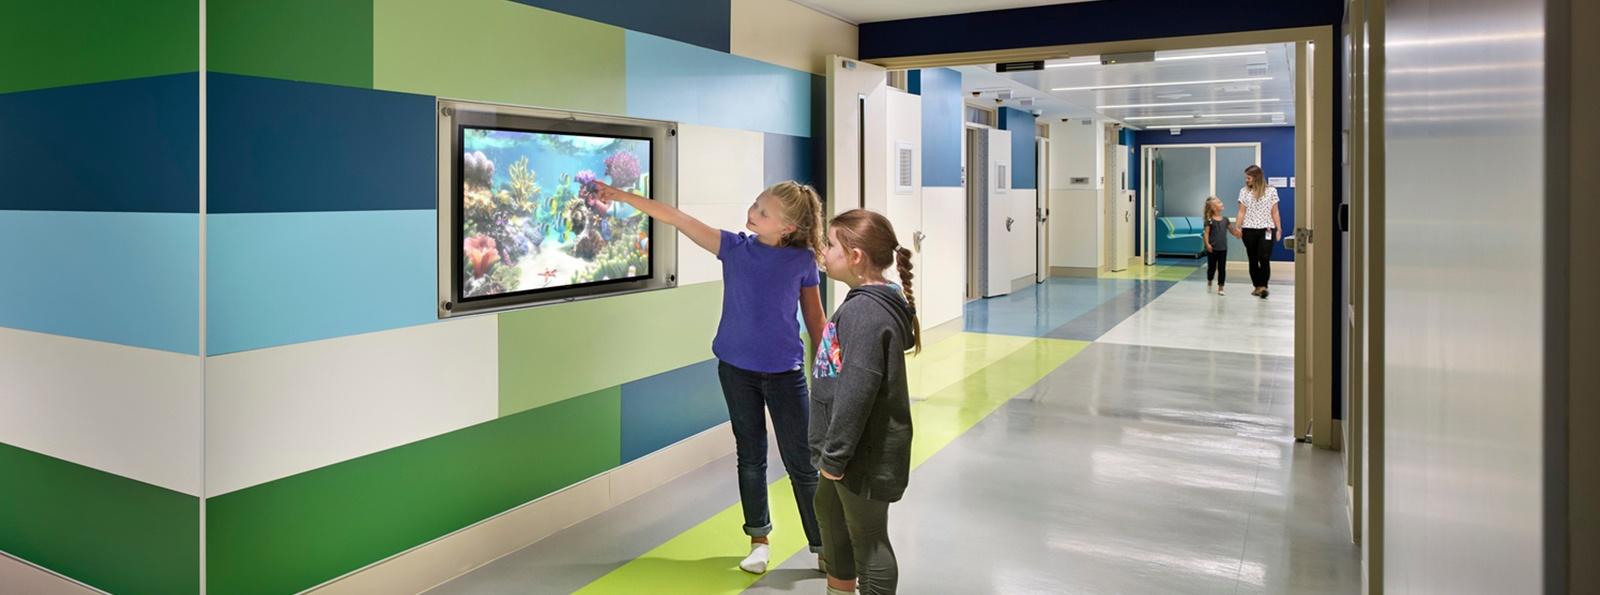 Children in Behavioral Health Facility